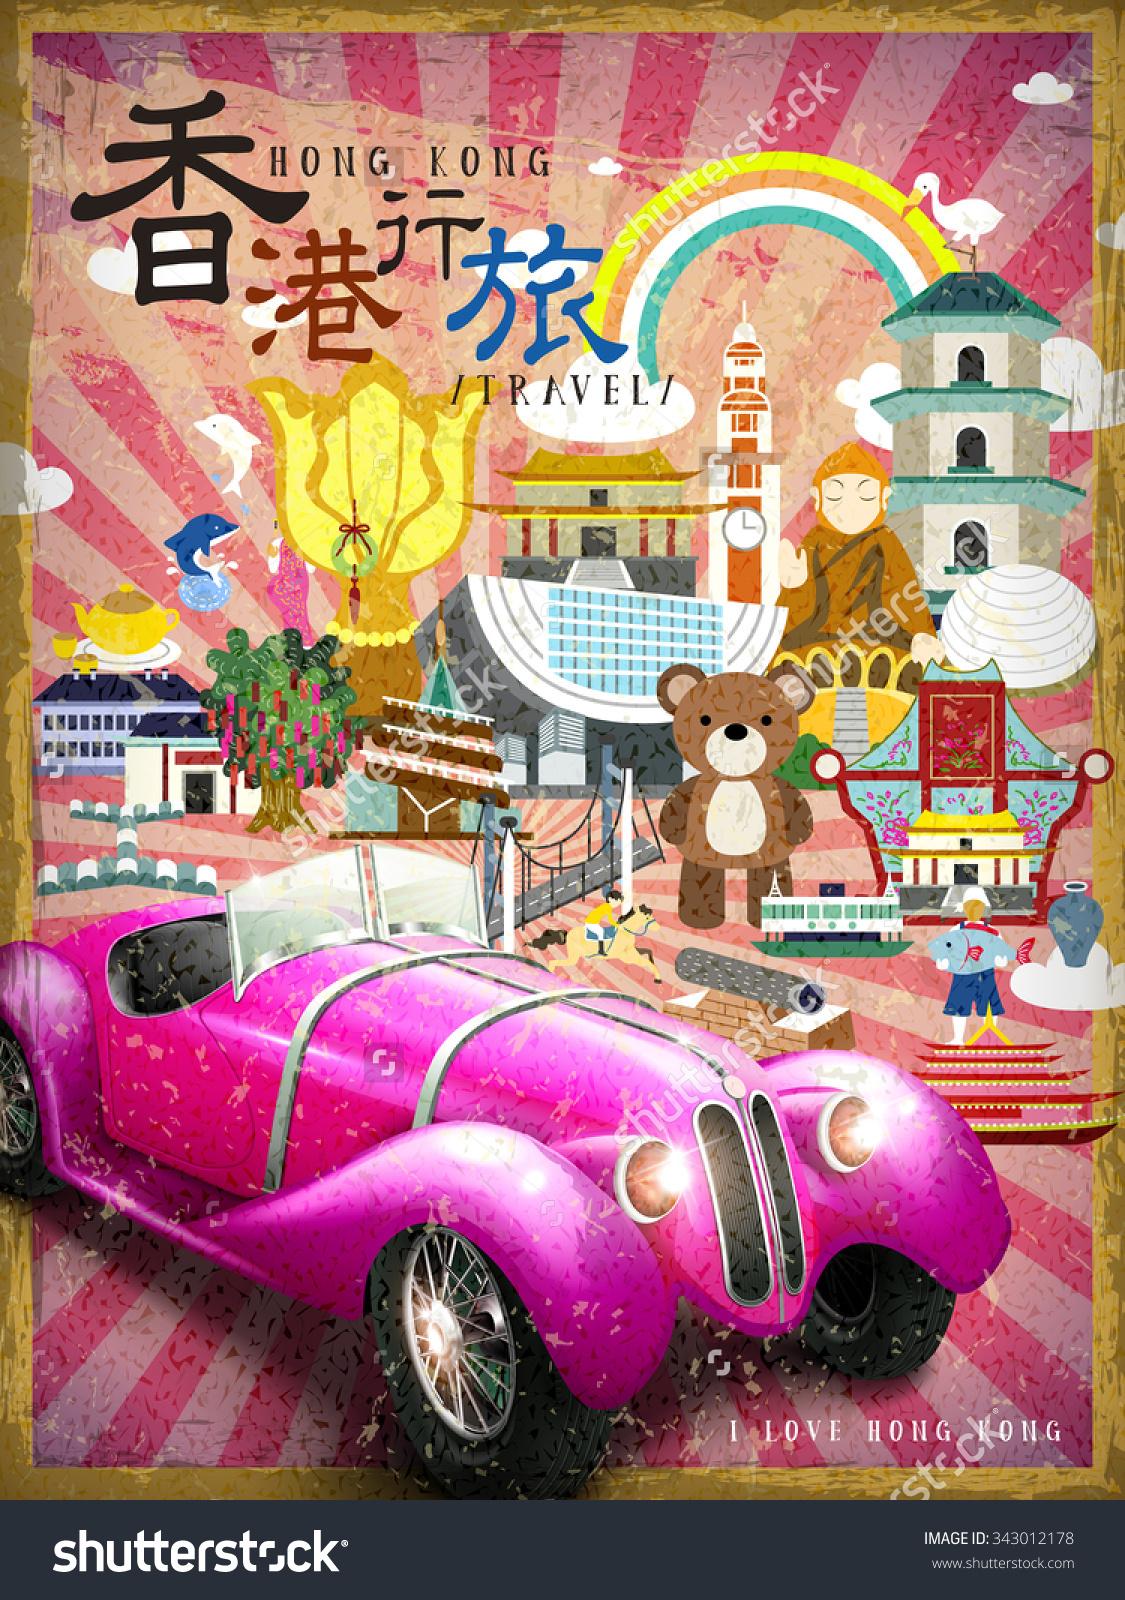 Poster design hong kong - Hong Kong Travel Poster Design With Attractive Car The Upper Left Title Is Hong Kong